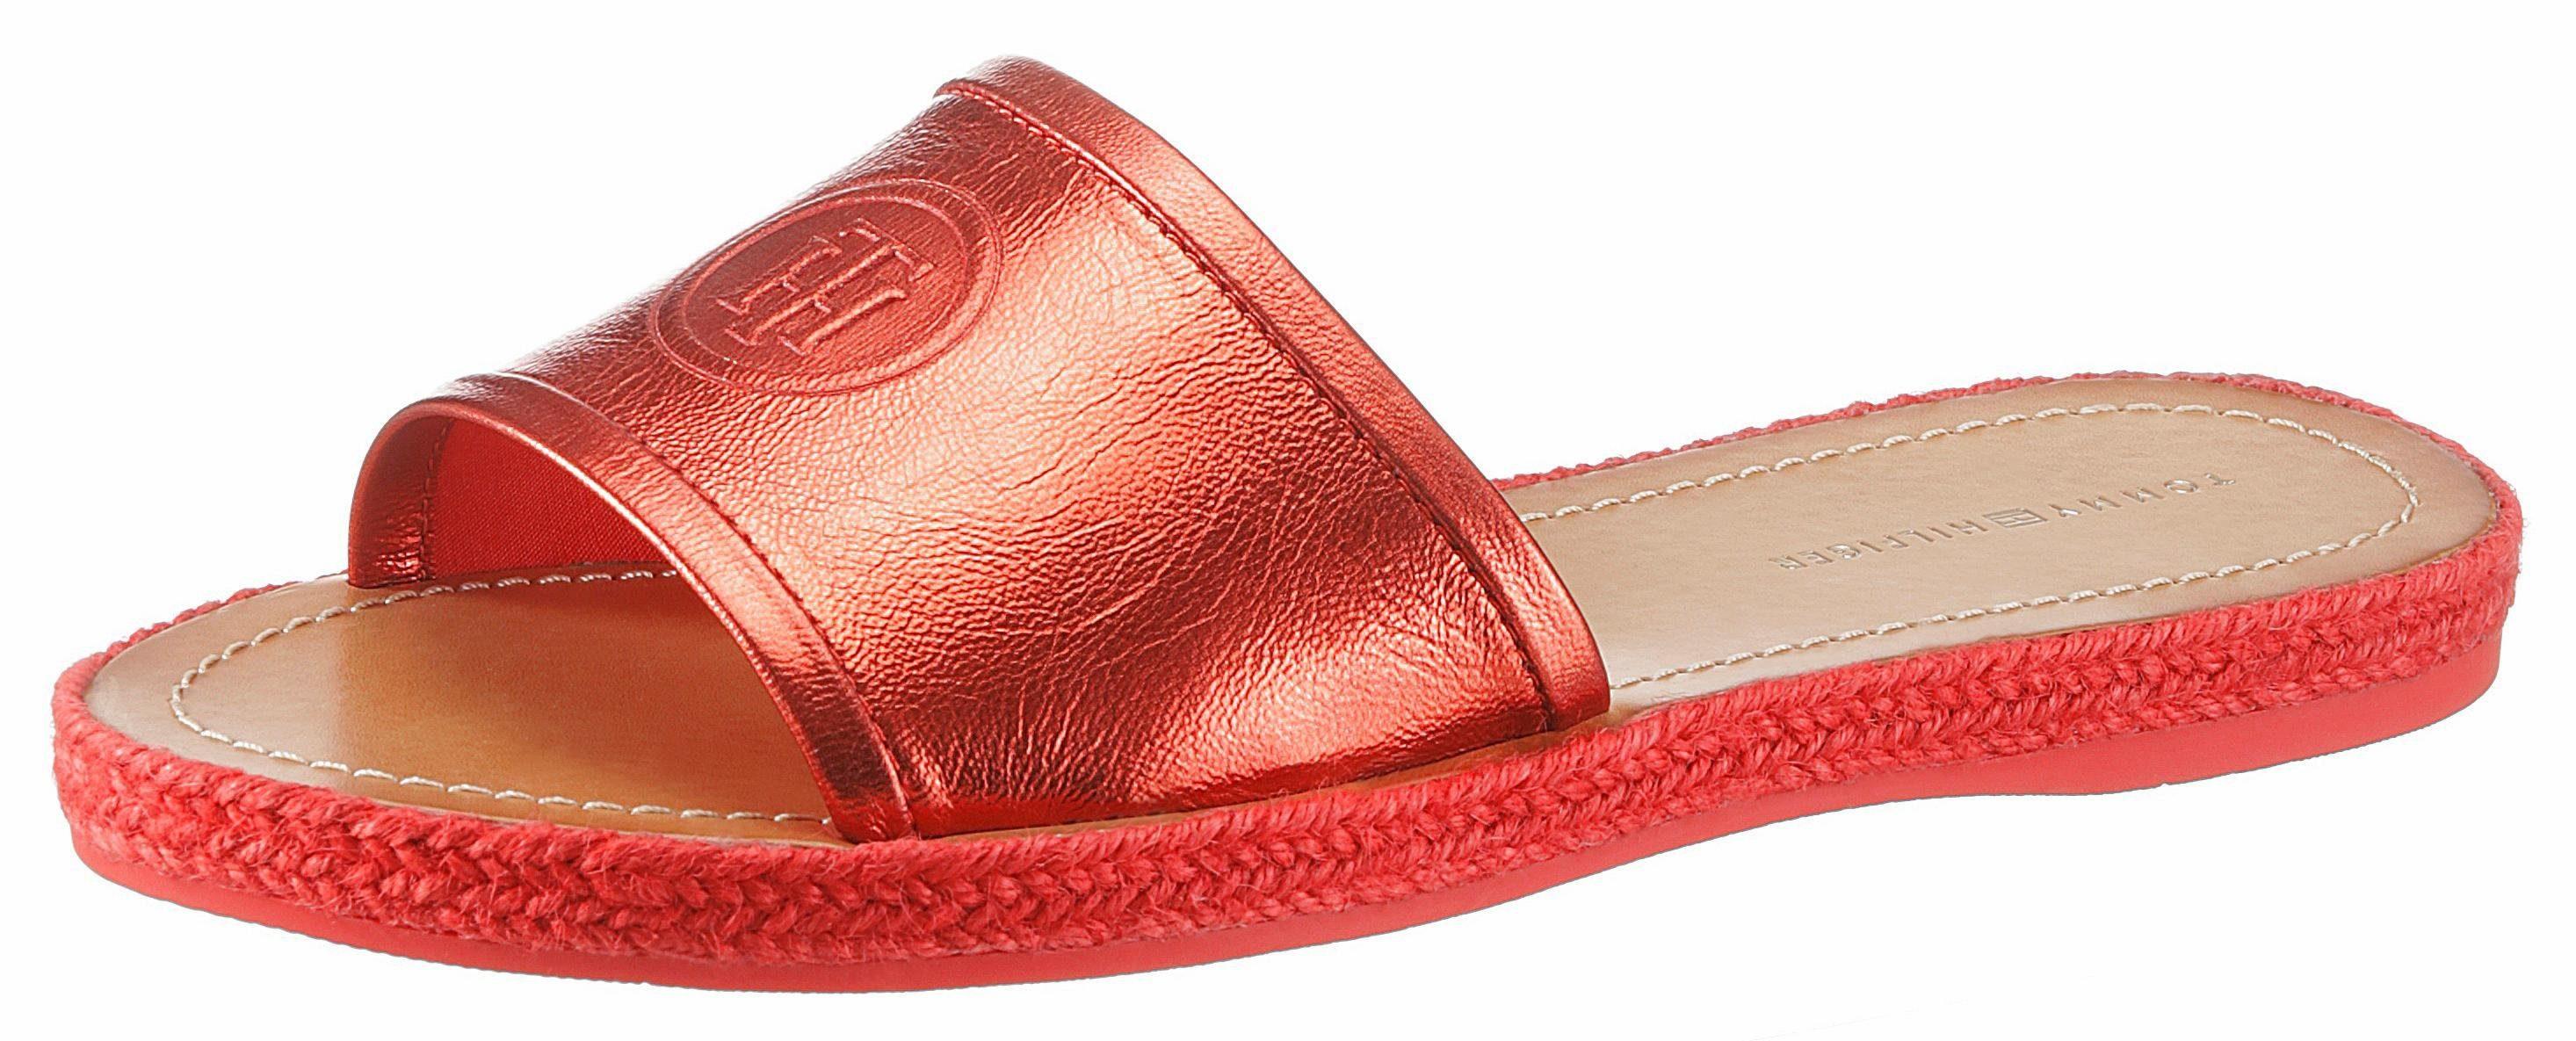 Tommy Hilfiger »Joyce« Pantolette, mit Metallic Effekt, rot, EURO-Größen, rostrot